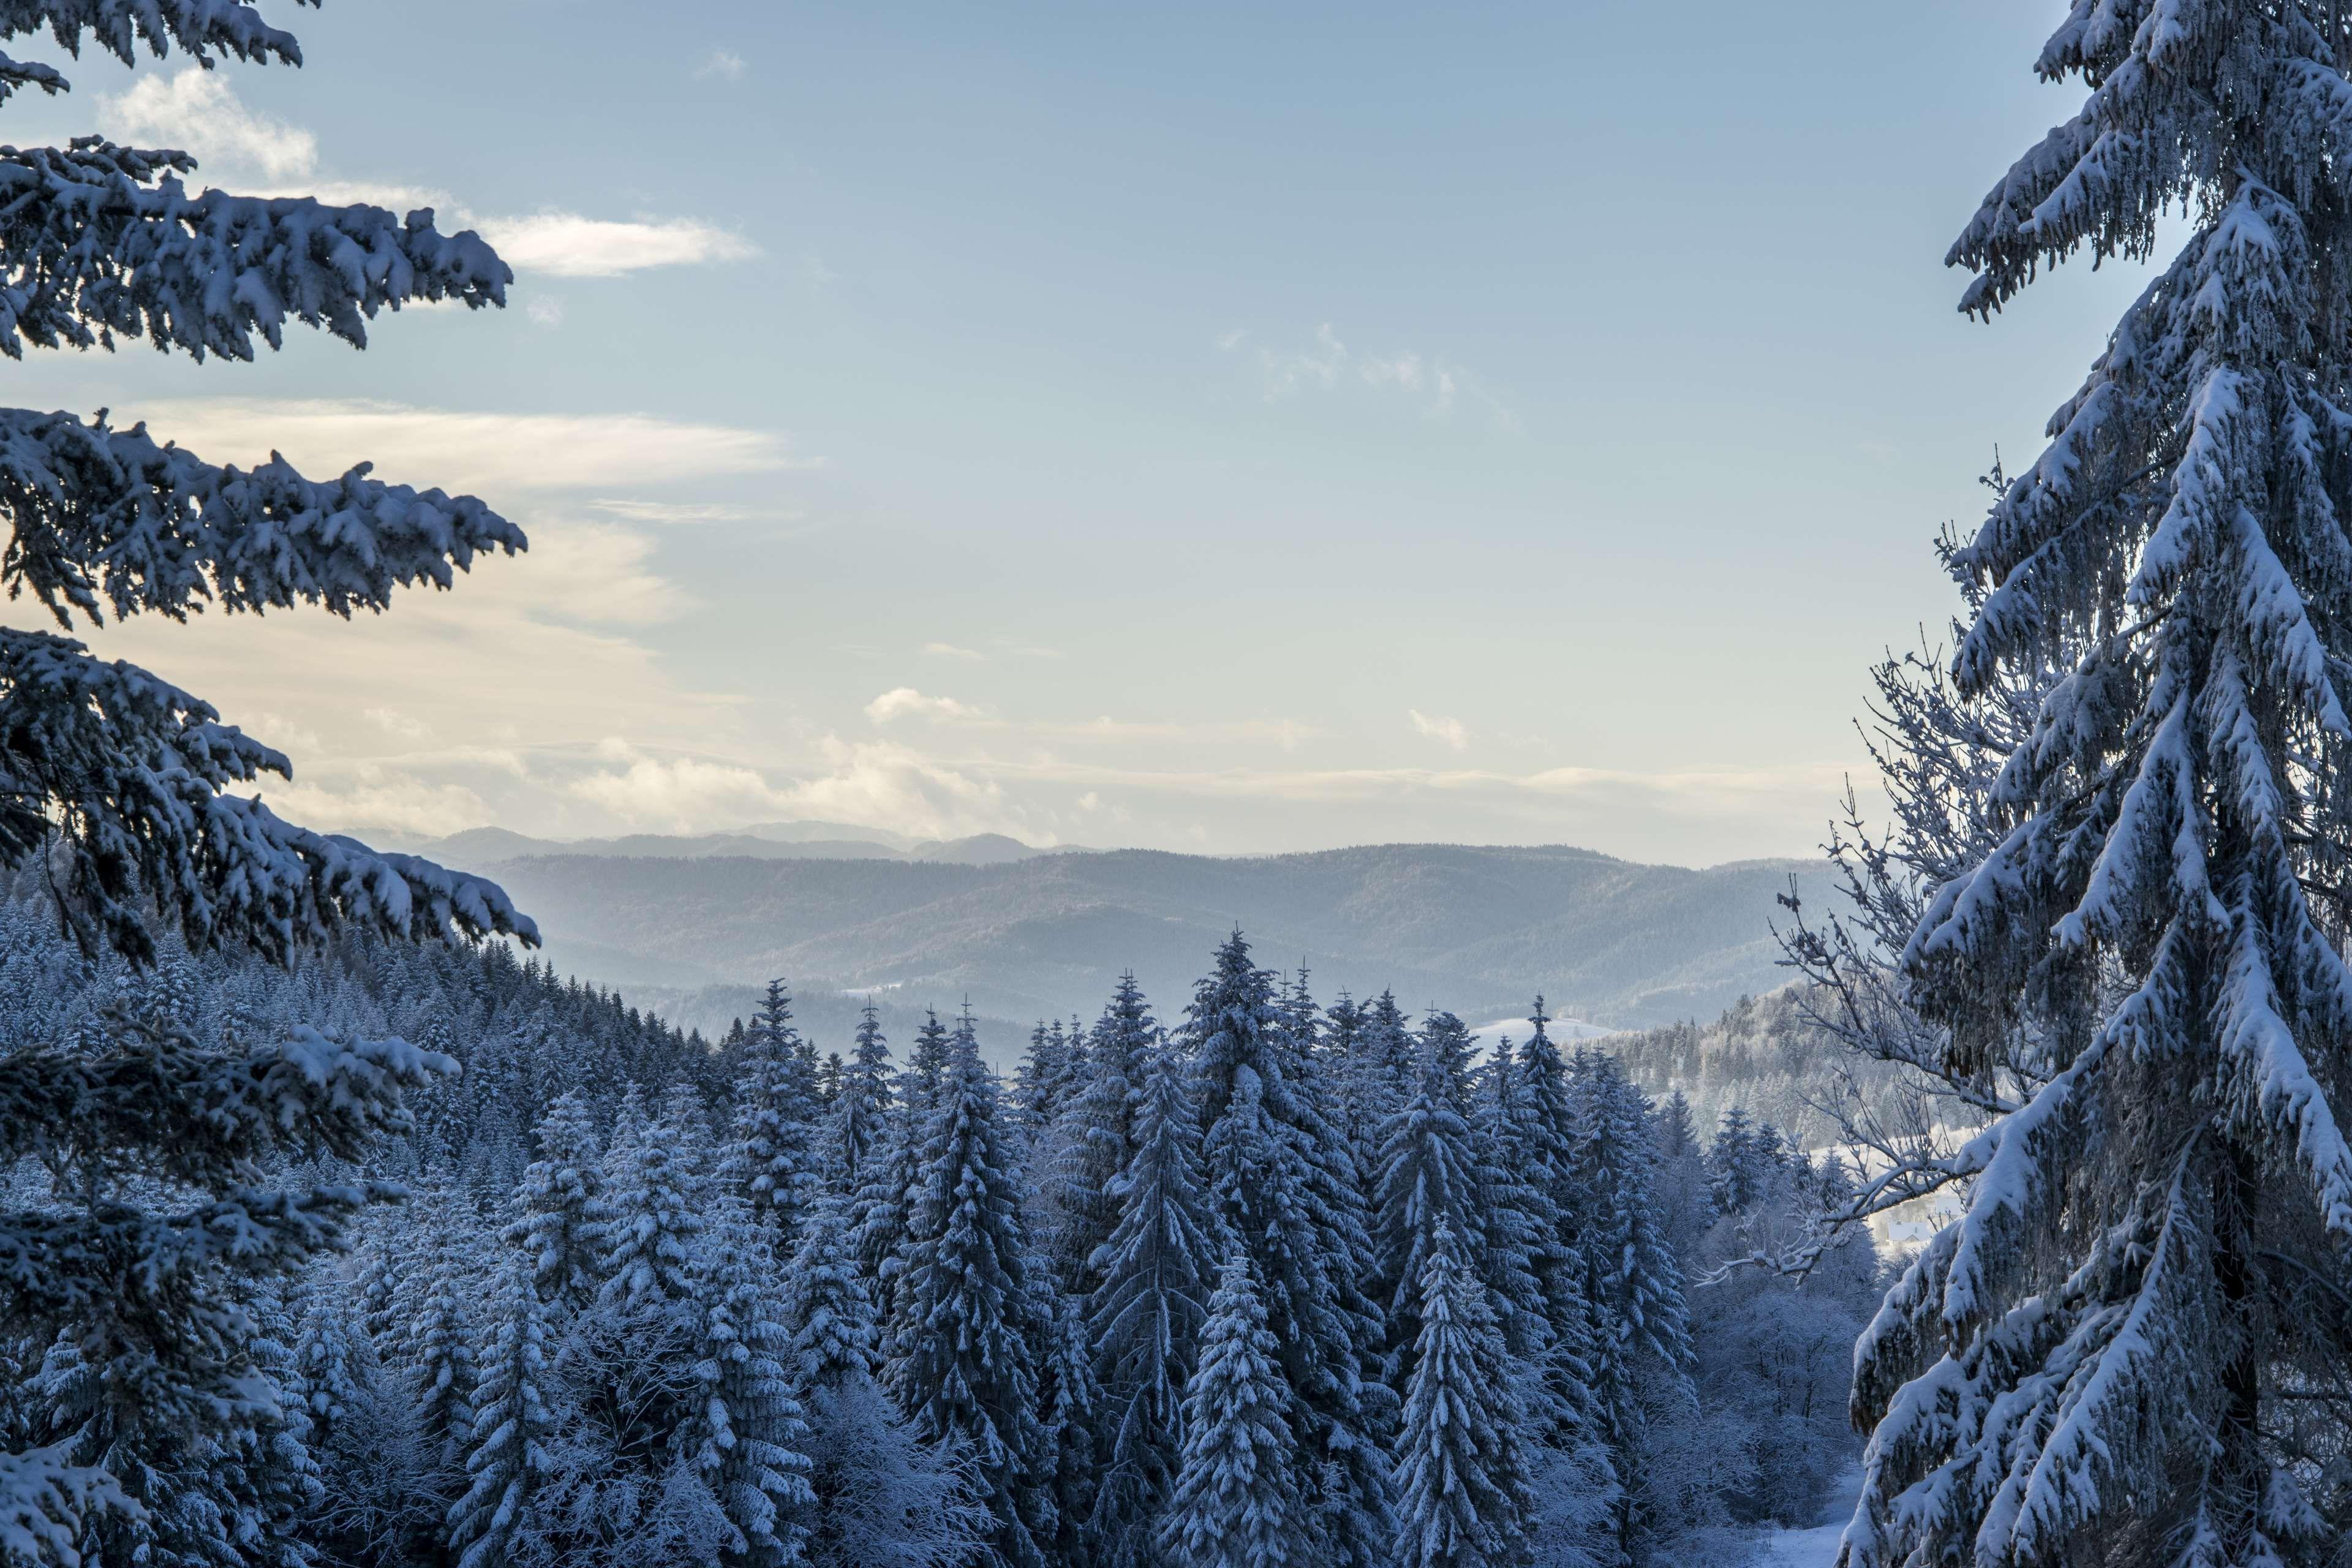 mountains nature pine trees snow winter winter landscape